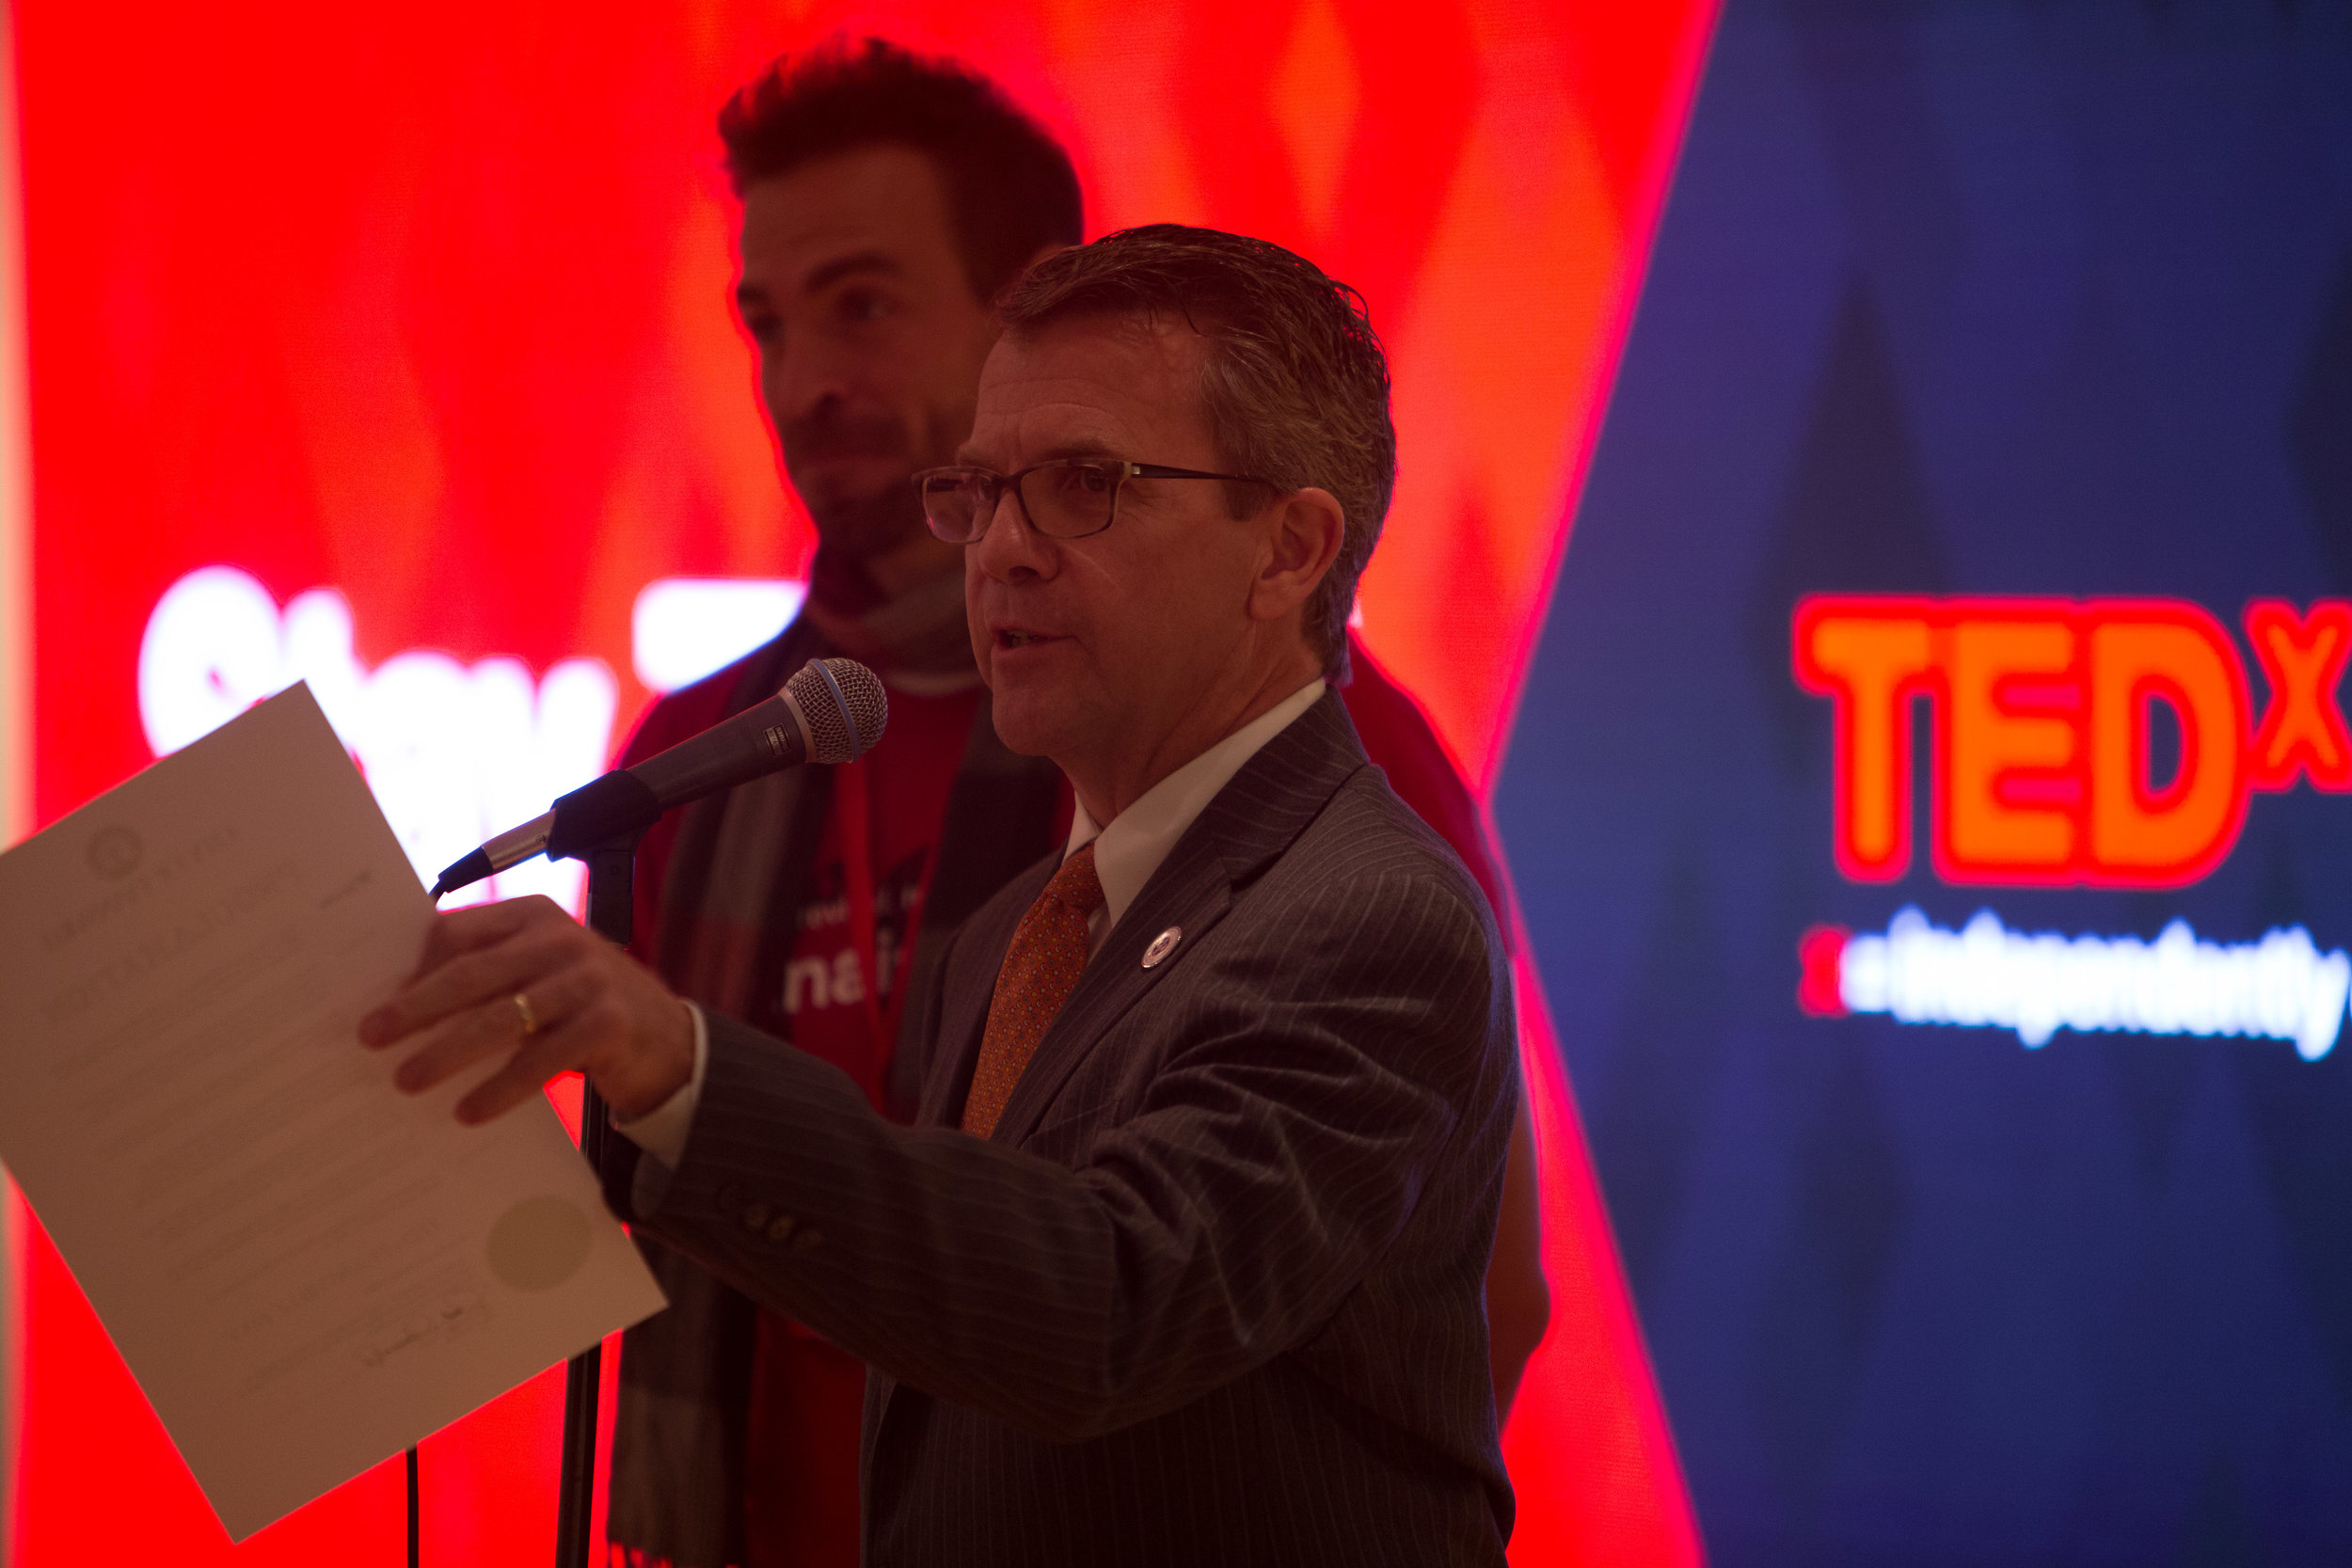 Zac with Mayor Lloyd Winnecke at TEDxEvansville 2015